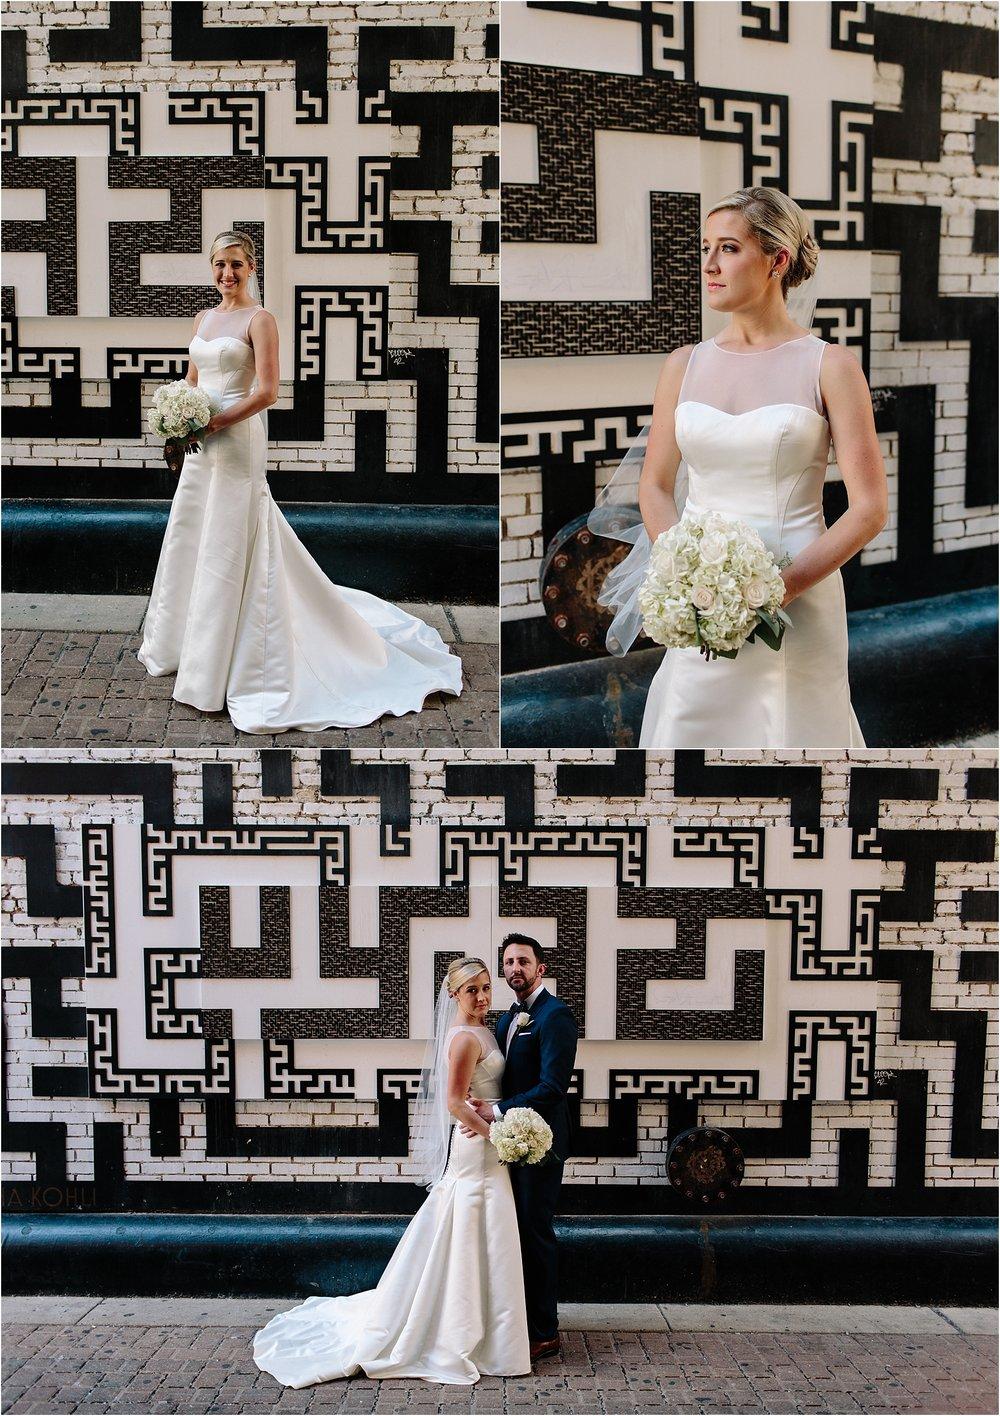 chicago-wedding-photographer-79.jpg